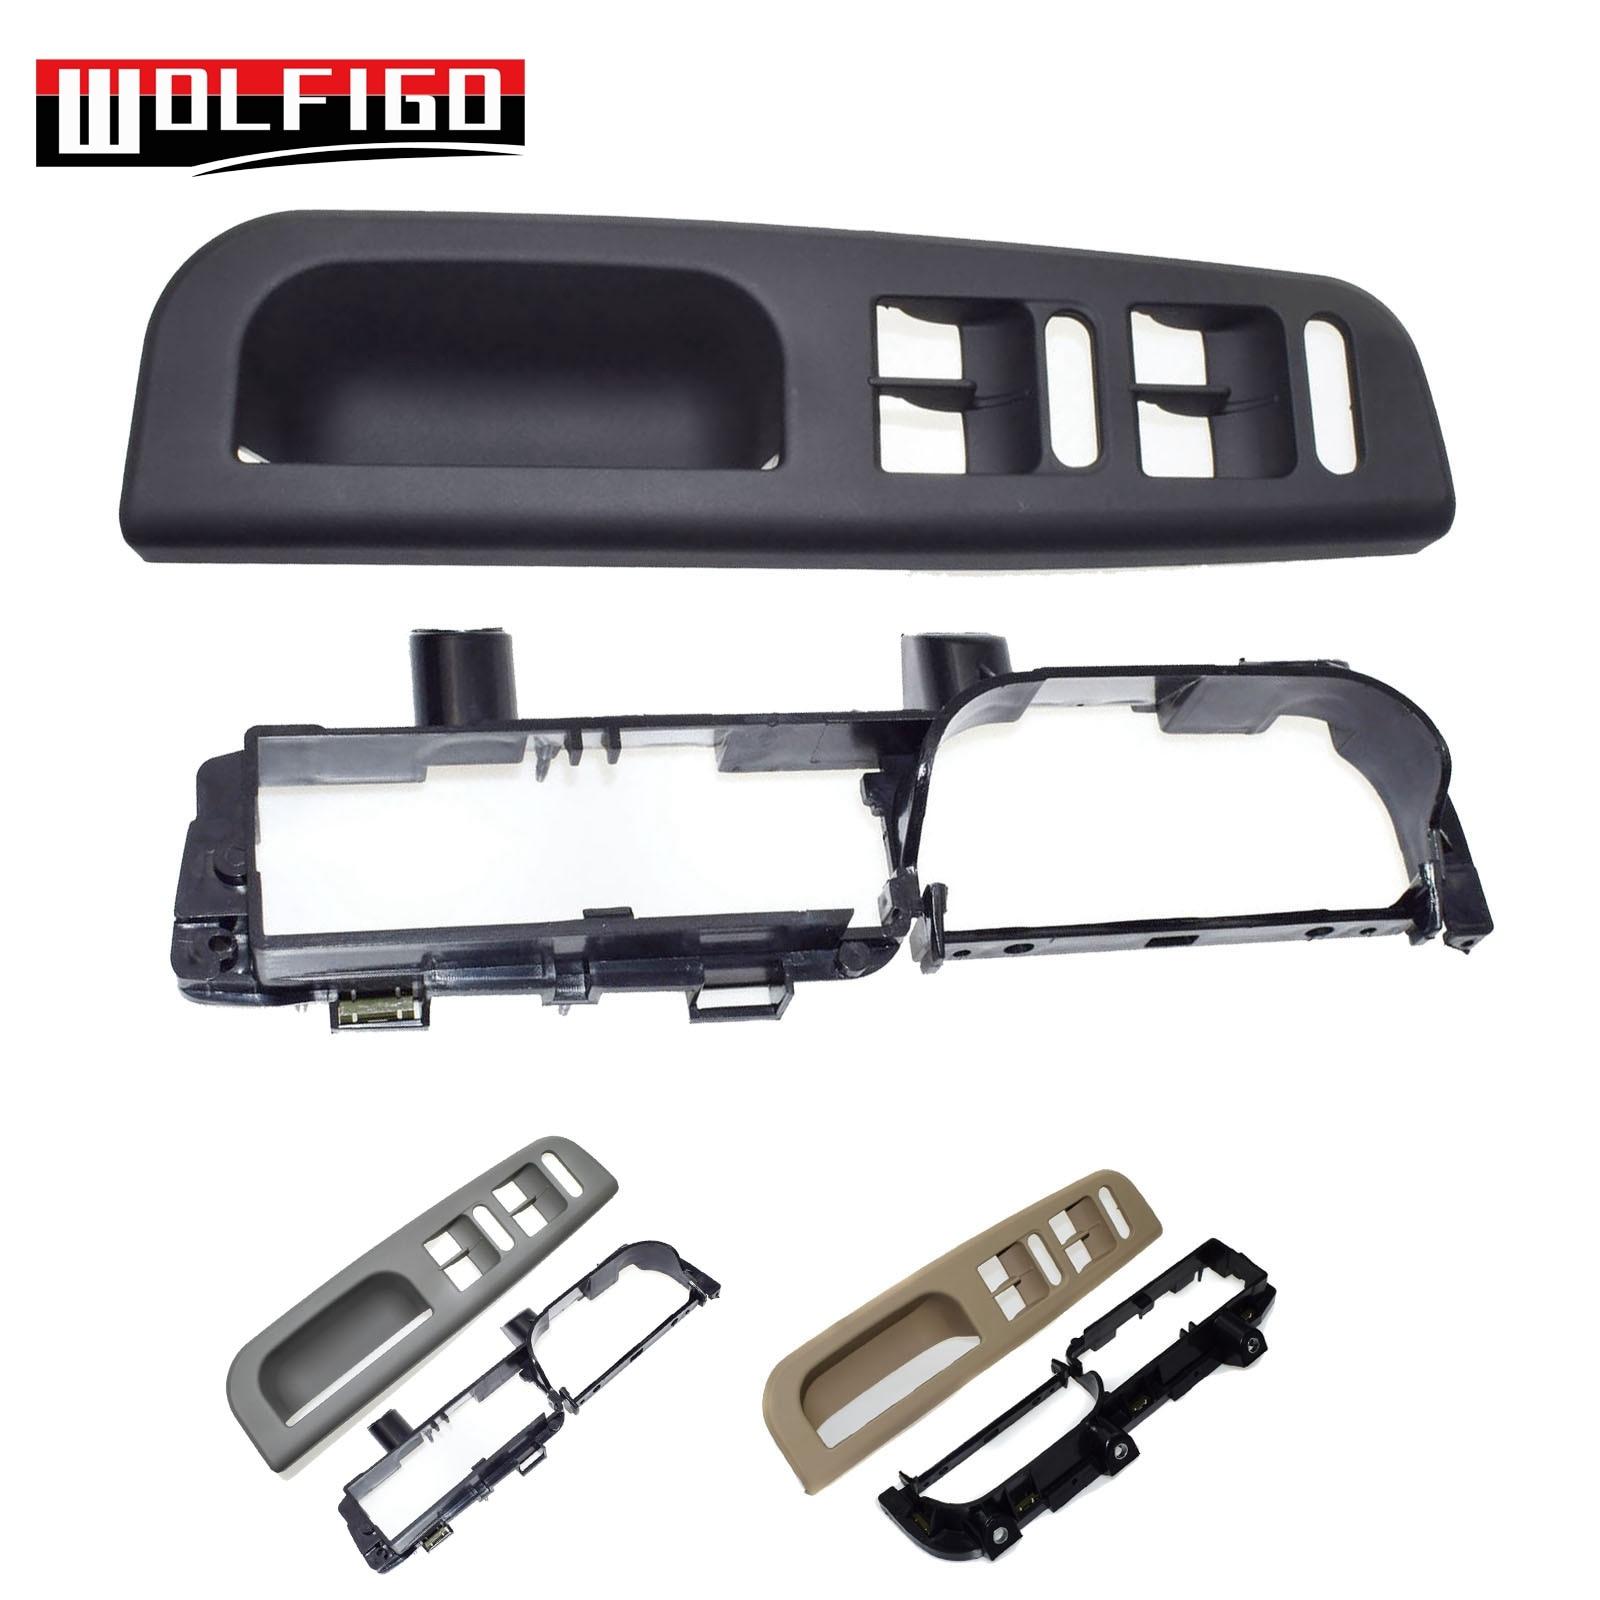 WOLFIGO gris/Negro/Beige 2 piezas interruptor frontal izquierdo bisel manija embellecedor Kit ajuste VW Passat MK4 1J1867179A, 3B1867171E nuevo